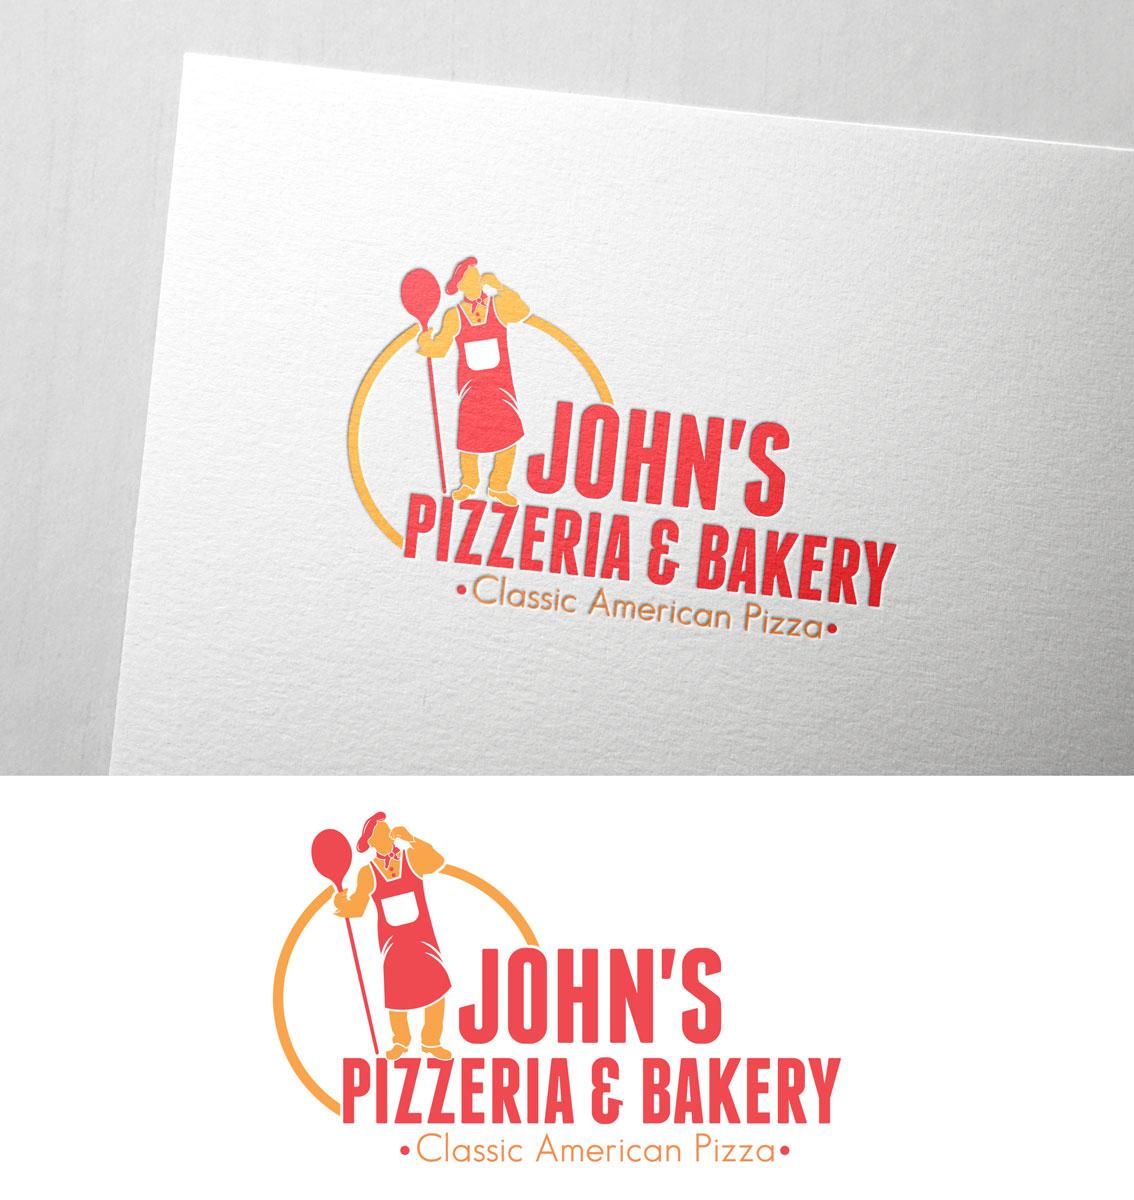 Masculine Upmarket Restaurant Logo Design For John S Pizzeria Bakery Classic American Pizza By Black Stallions Impressive Solutions Design 18959302